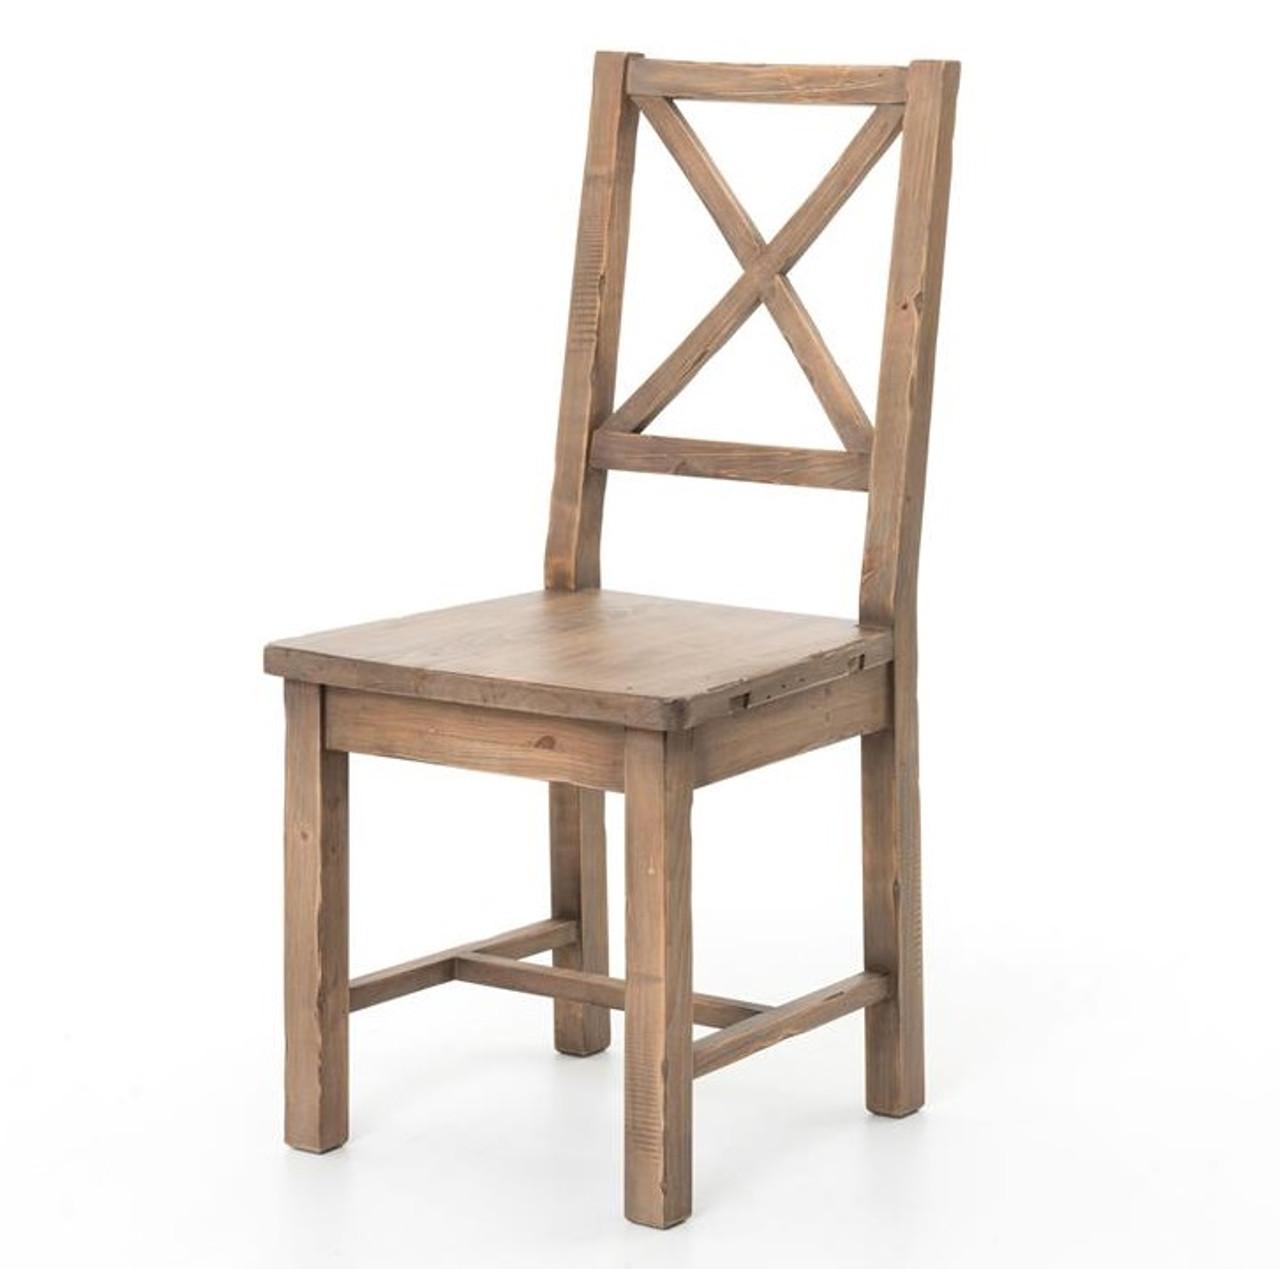 Coastal Rustic Solid Wood Dining Room Chair Zin Home